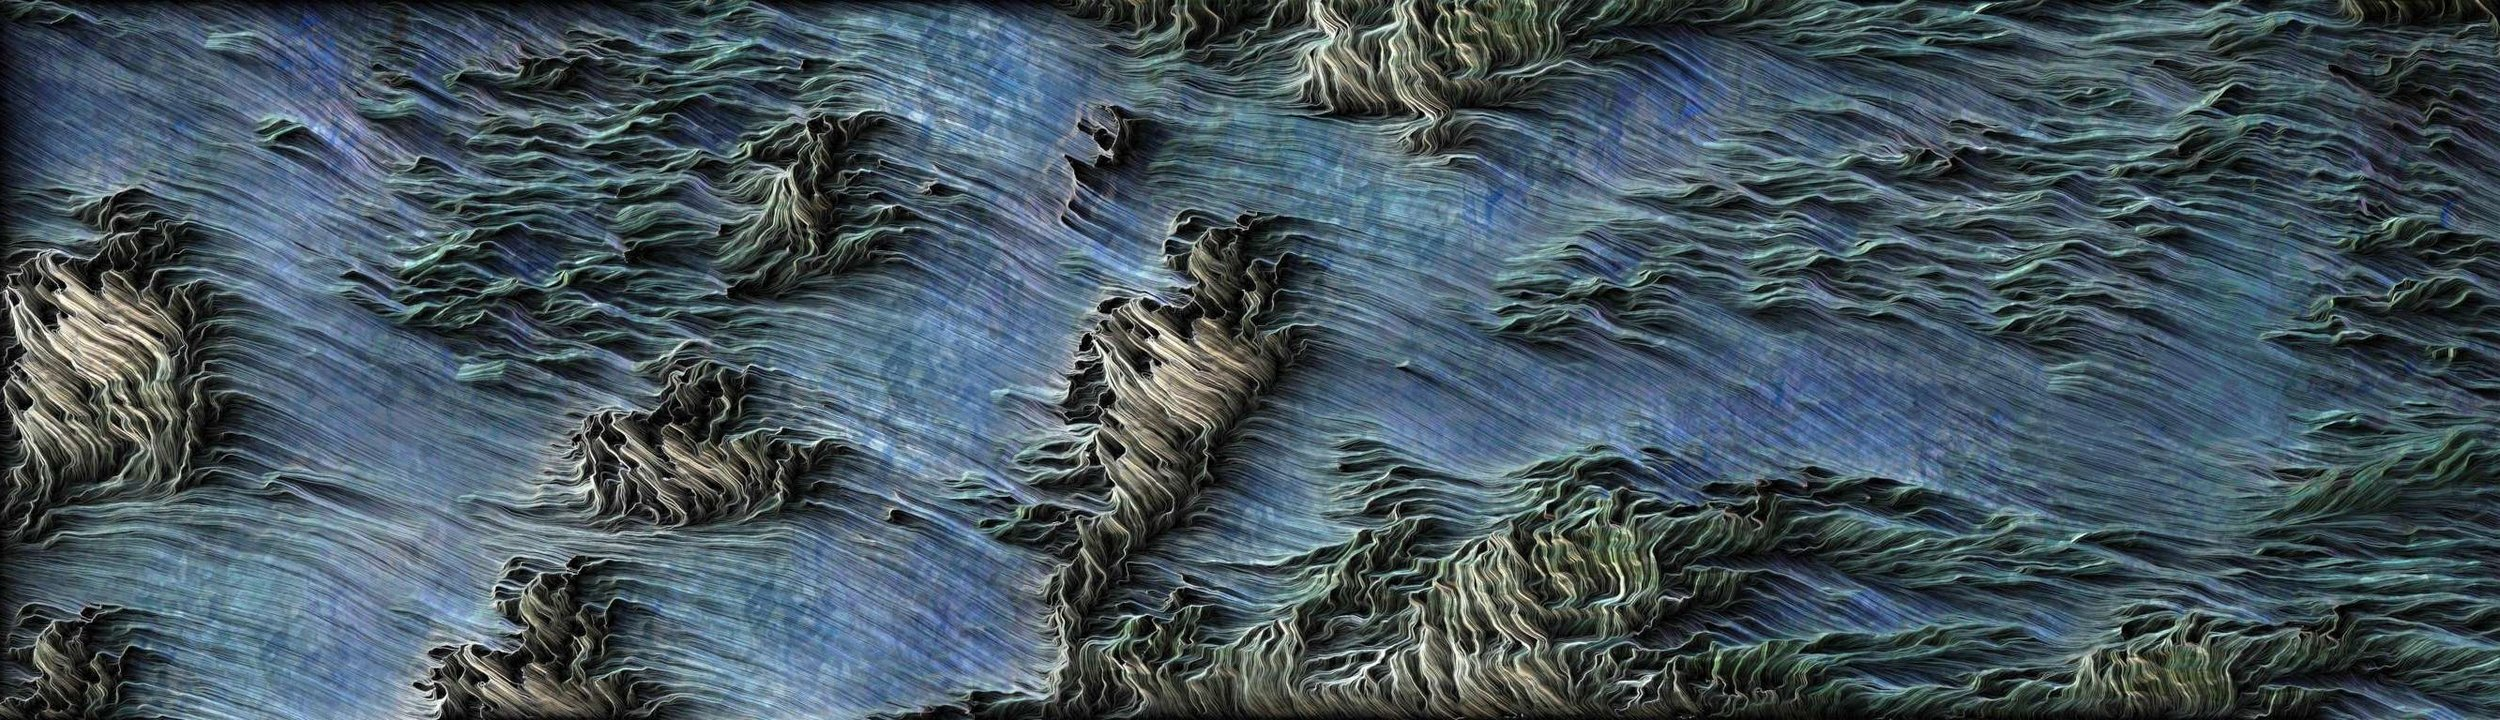 Cuzco  - 2019 - New Media - Computational engraving on aluminium - 16.5 x 57 inches / 42 x 145 cm